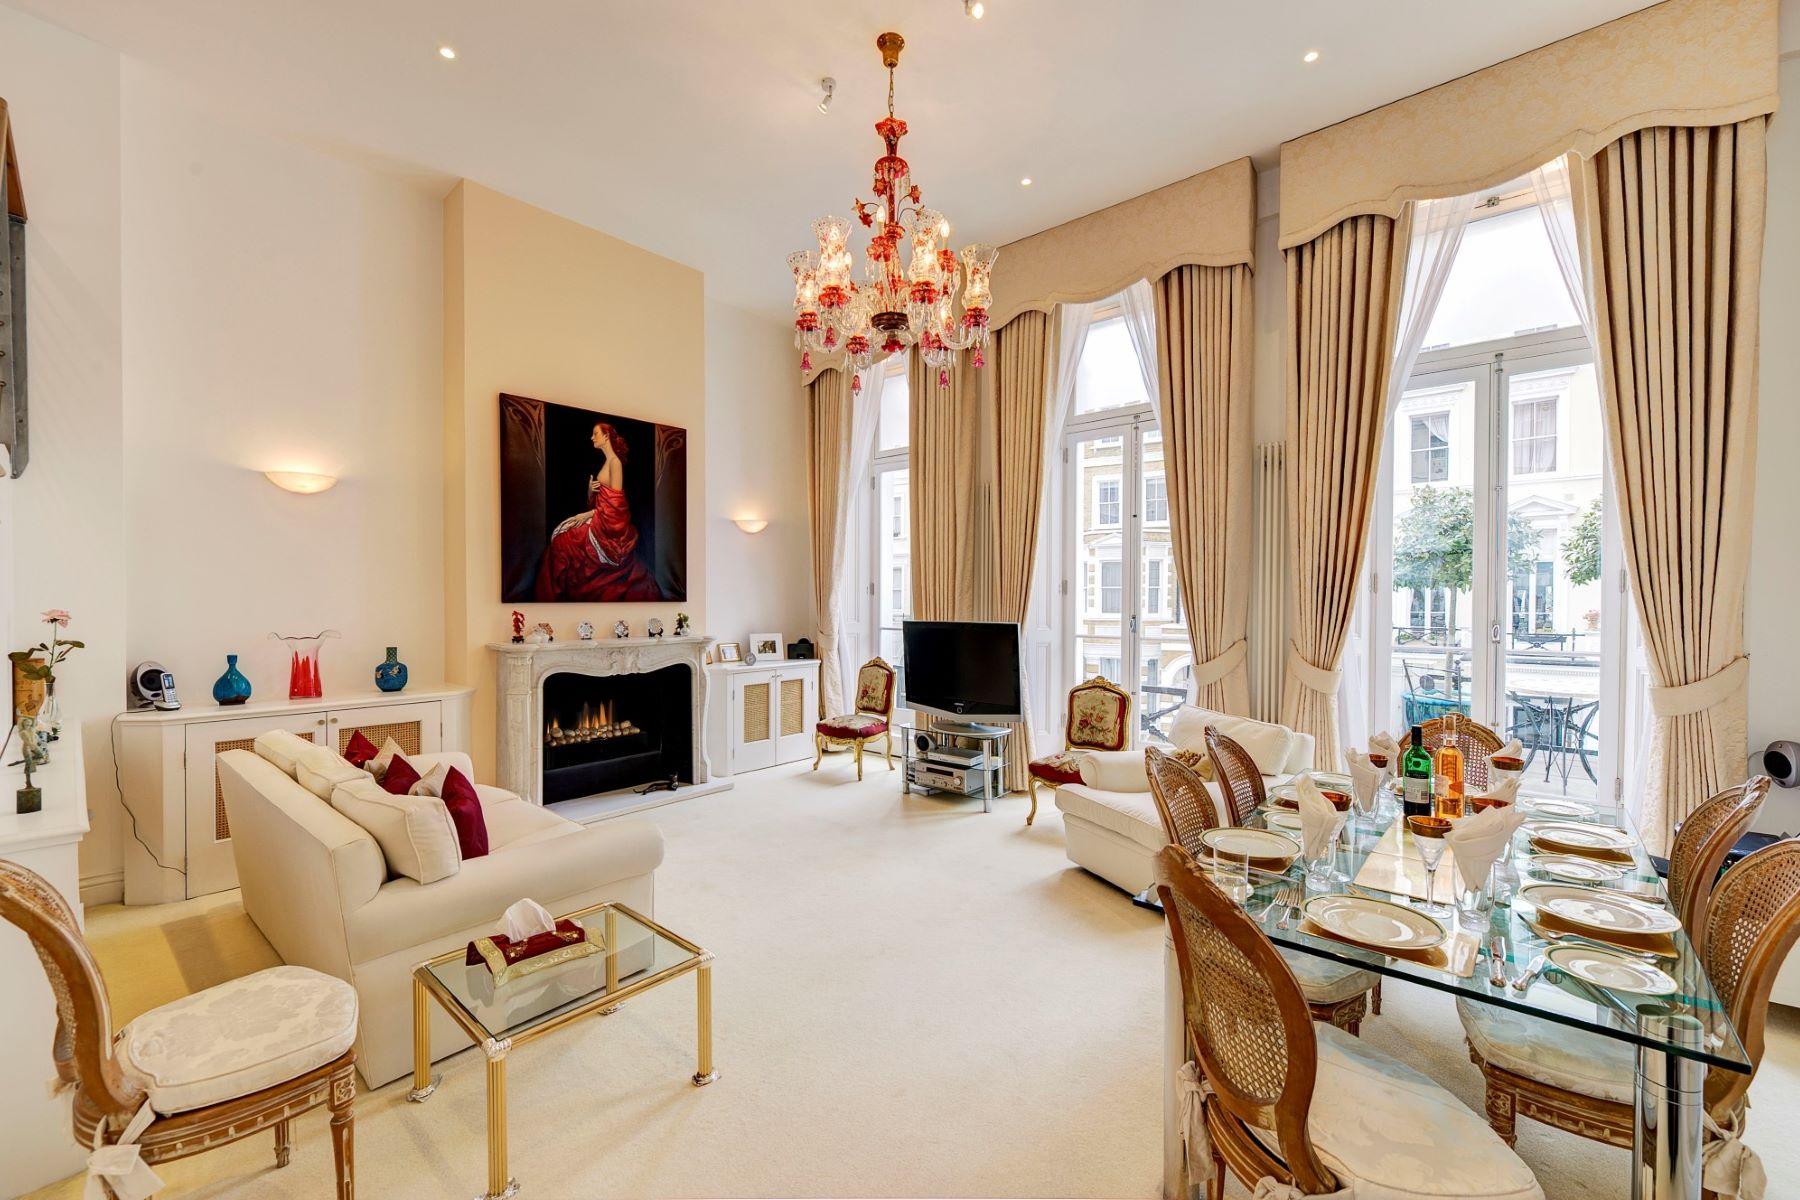 Apartamento para Venda às Lexham Gardens, Kensington, London London, Inglaterra, Reino Unido